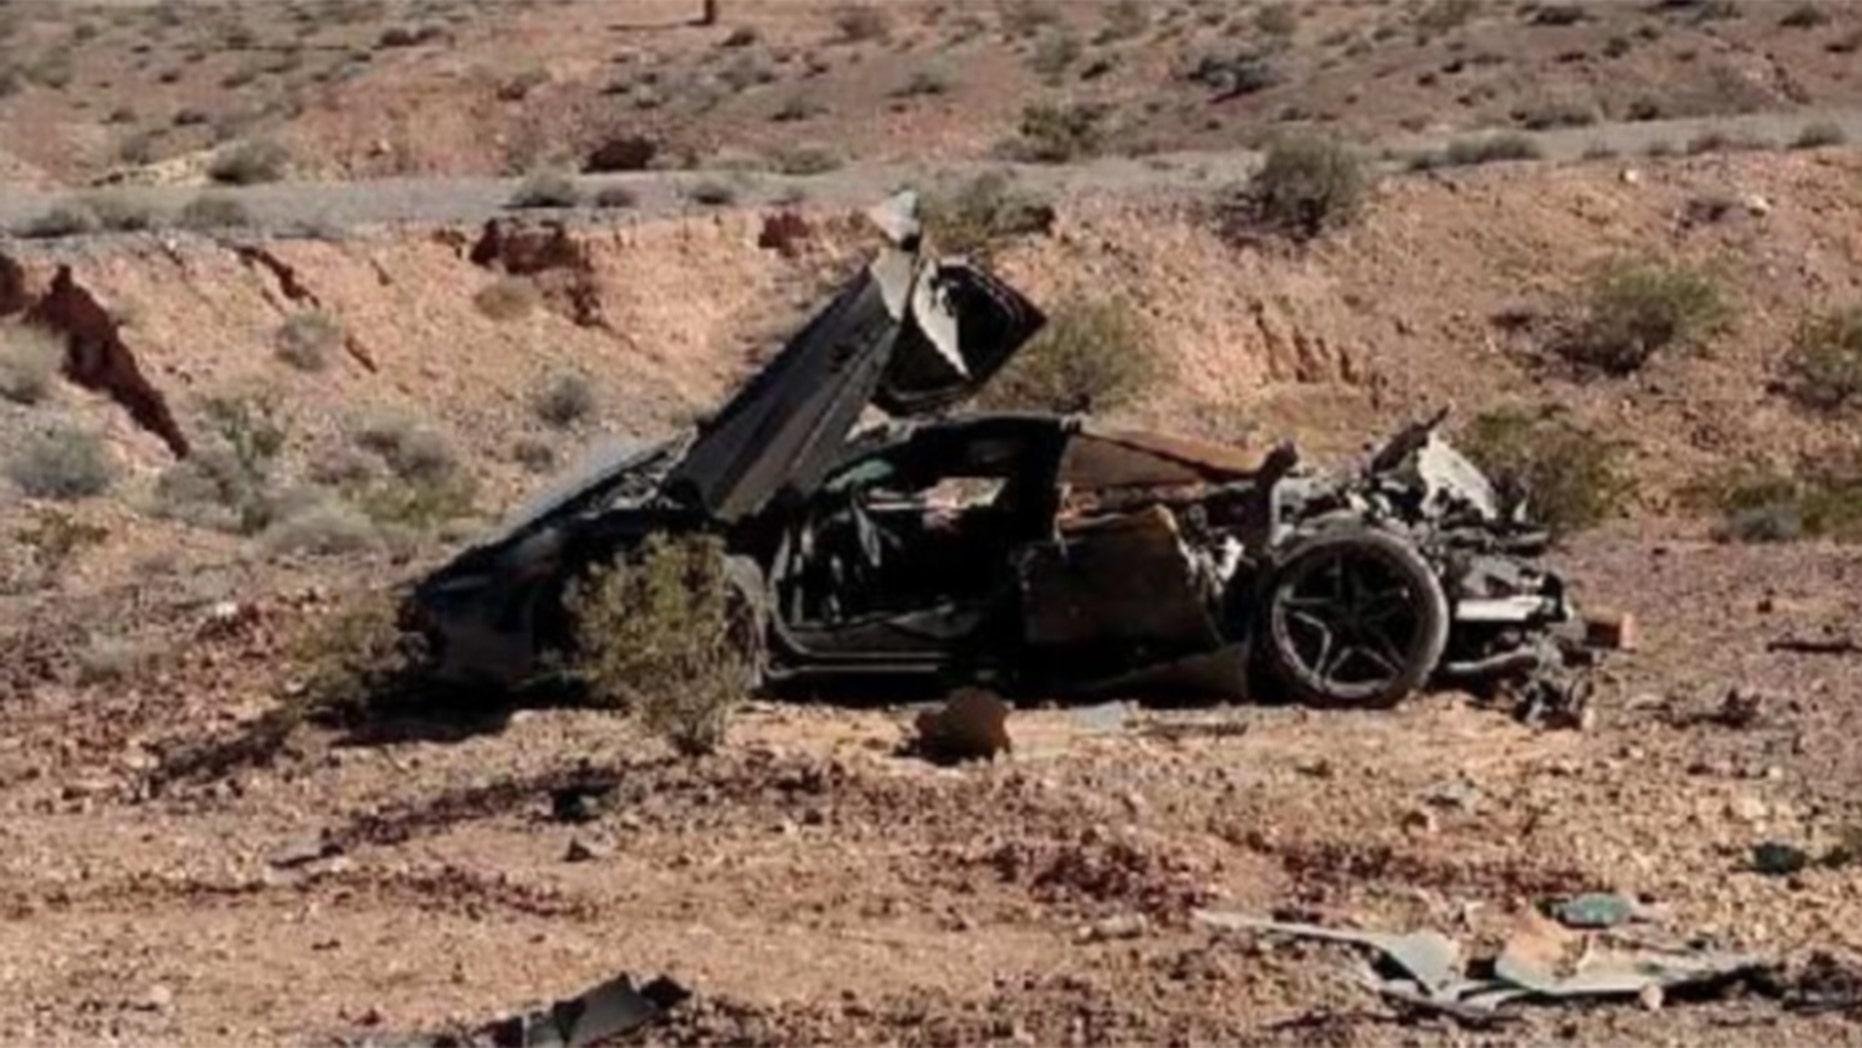 Nevada Police Find Wrecked 300 000 Mclaren Supercar In The Desert